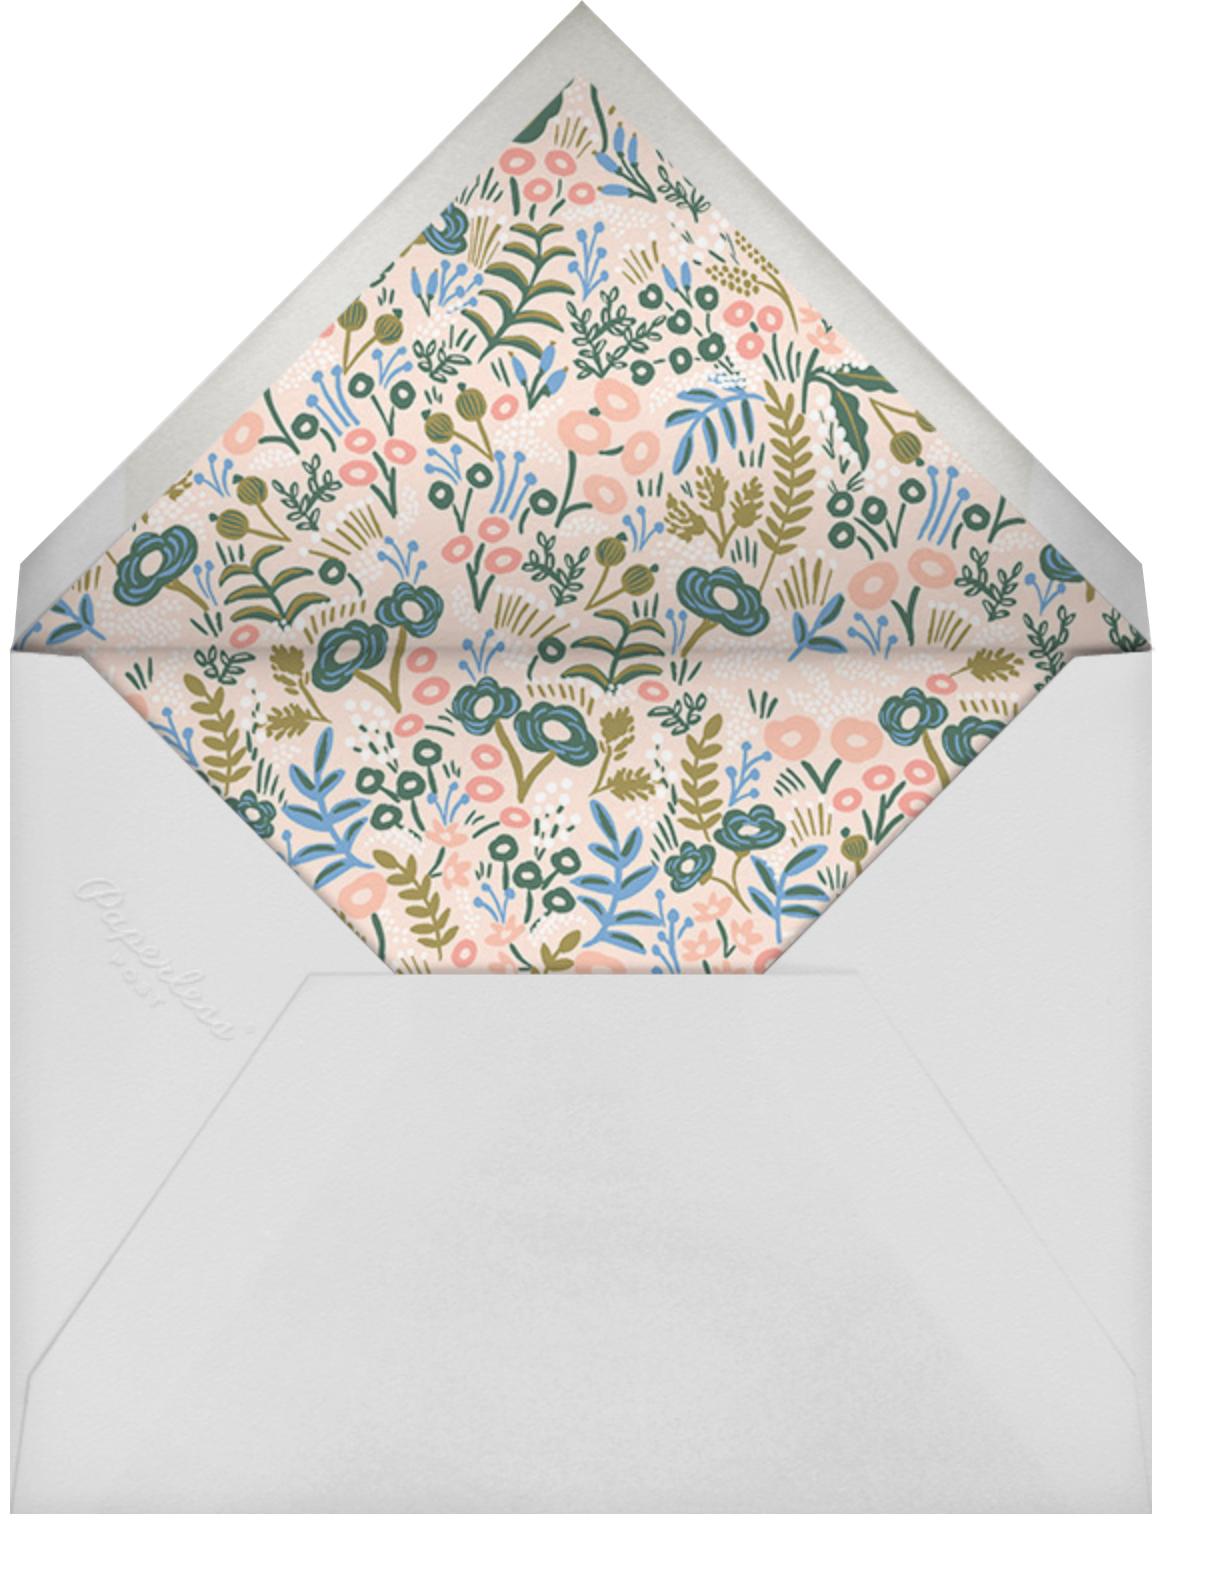 Floral Tapestry - Lapis - Rifle Paper Co. - Autumn entertaining - envelope back